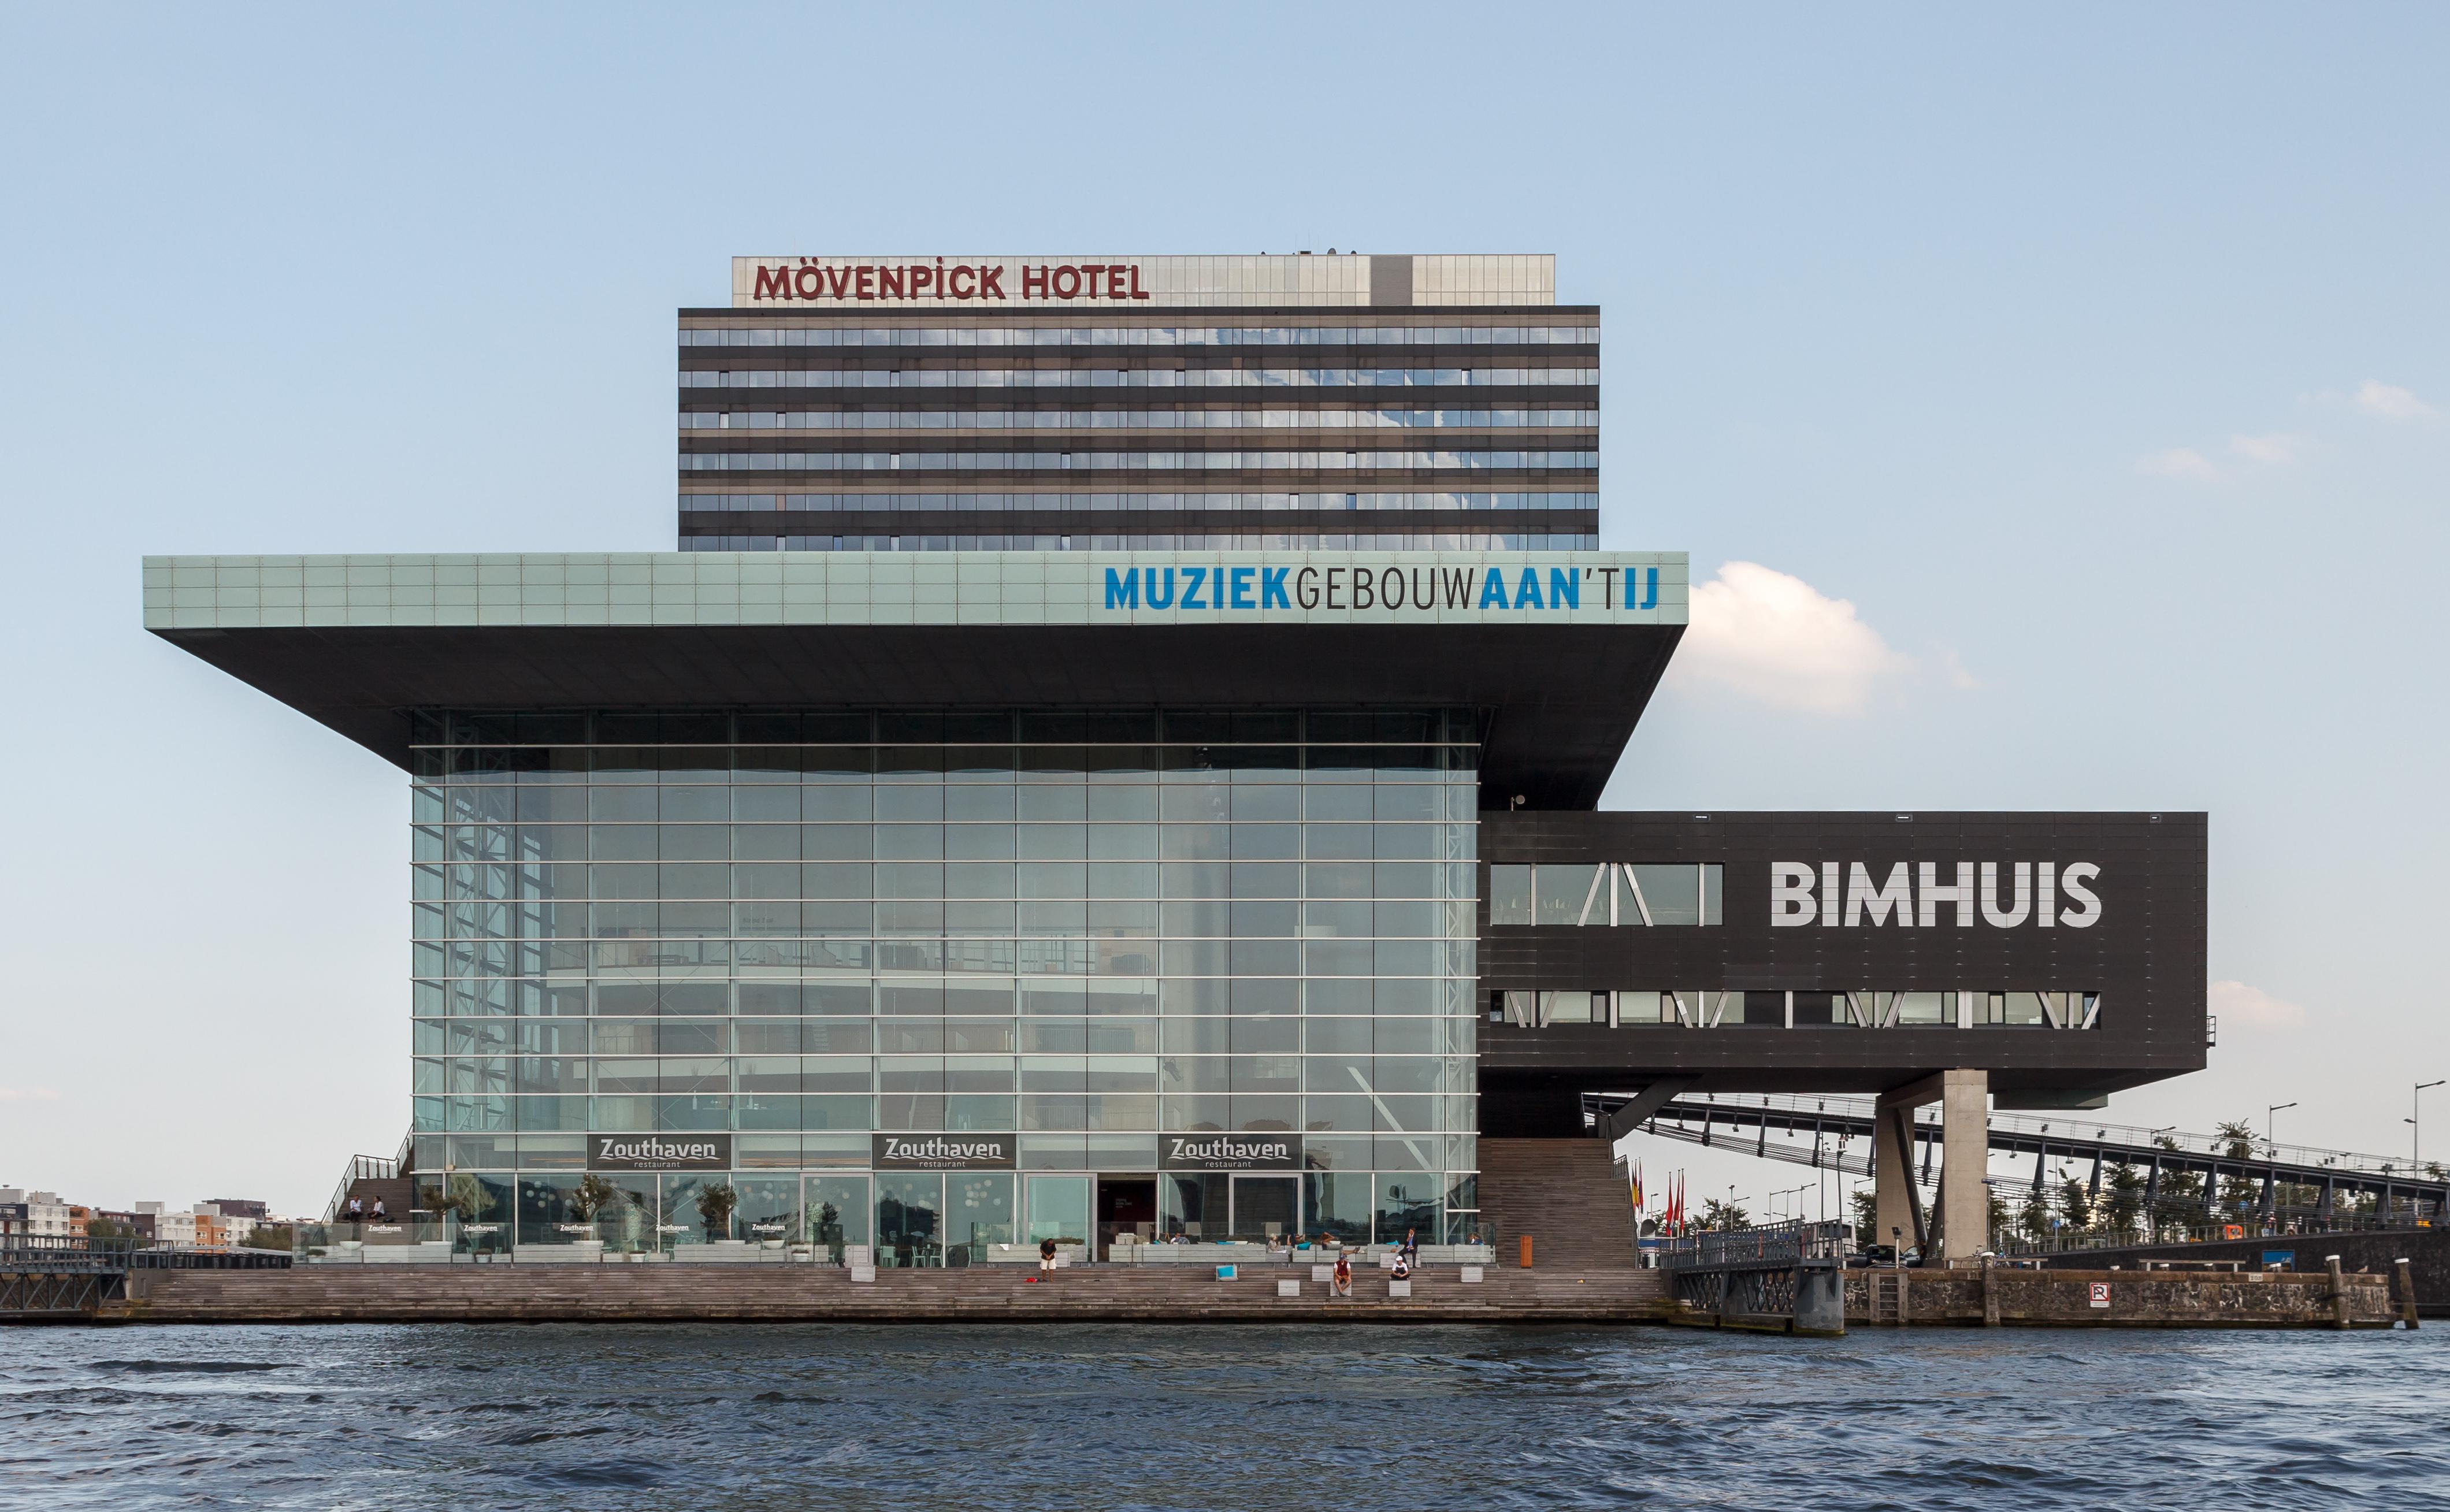 Hotel Ij Amsterdam